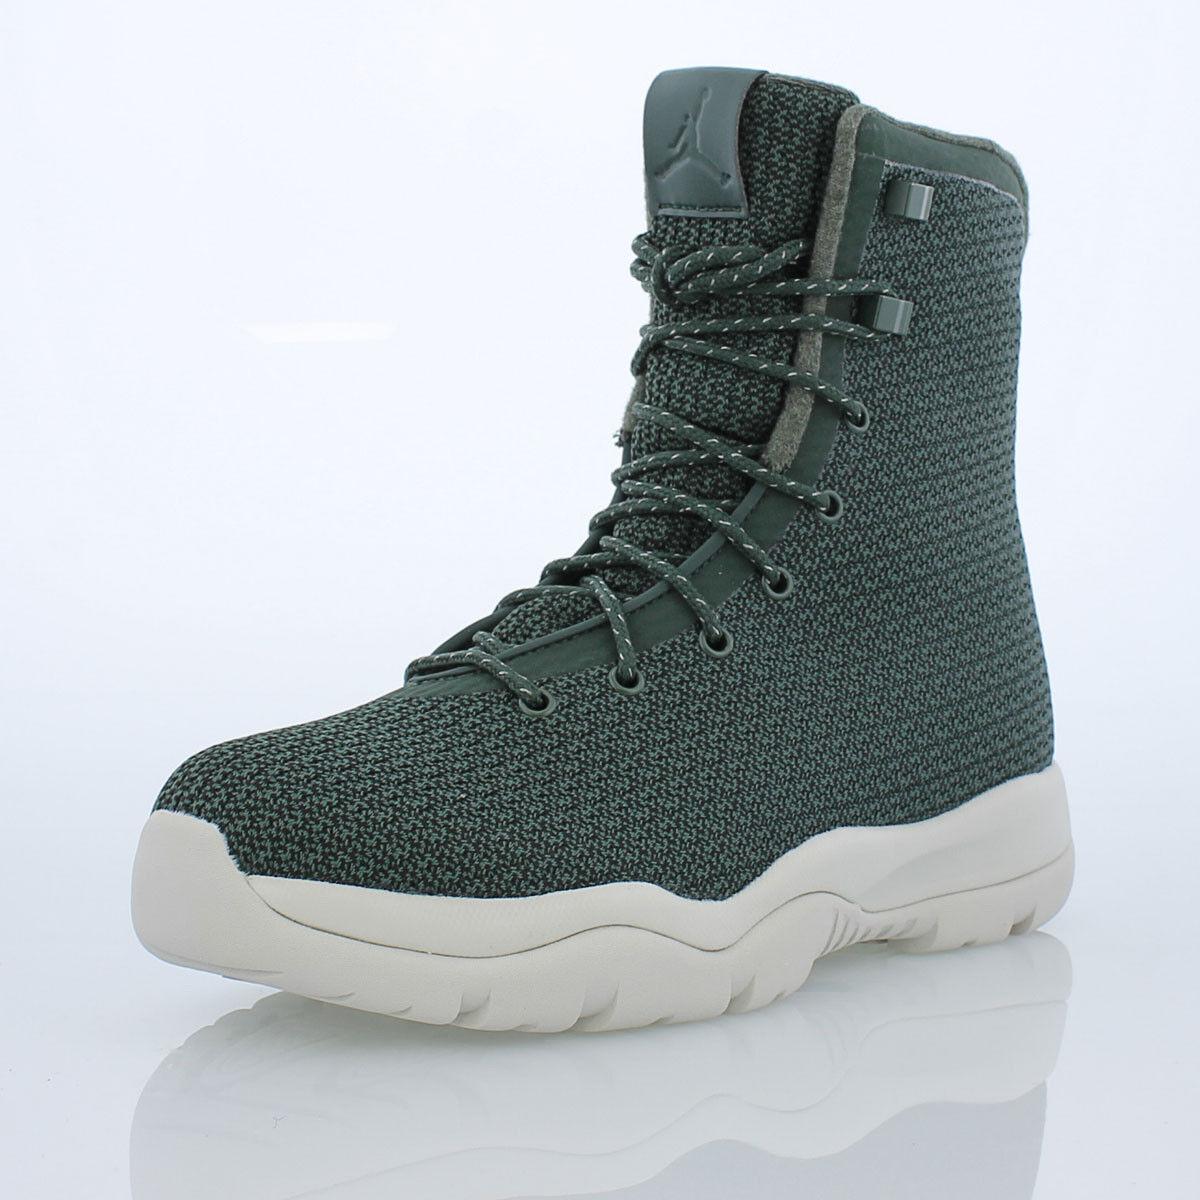 Jordan Men's 854554-300 Future Boots Waterproof Grove Green/Bone Comfortable Comfortable and good-looking